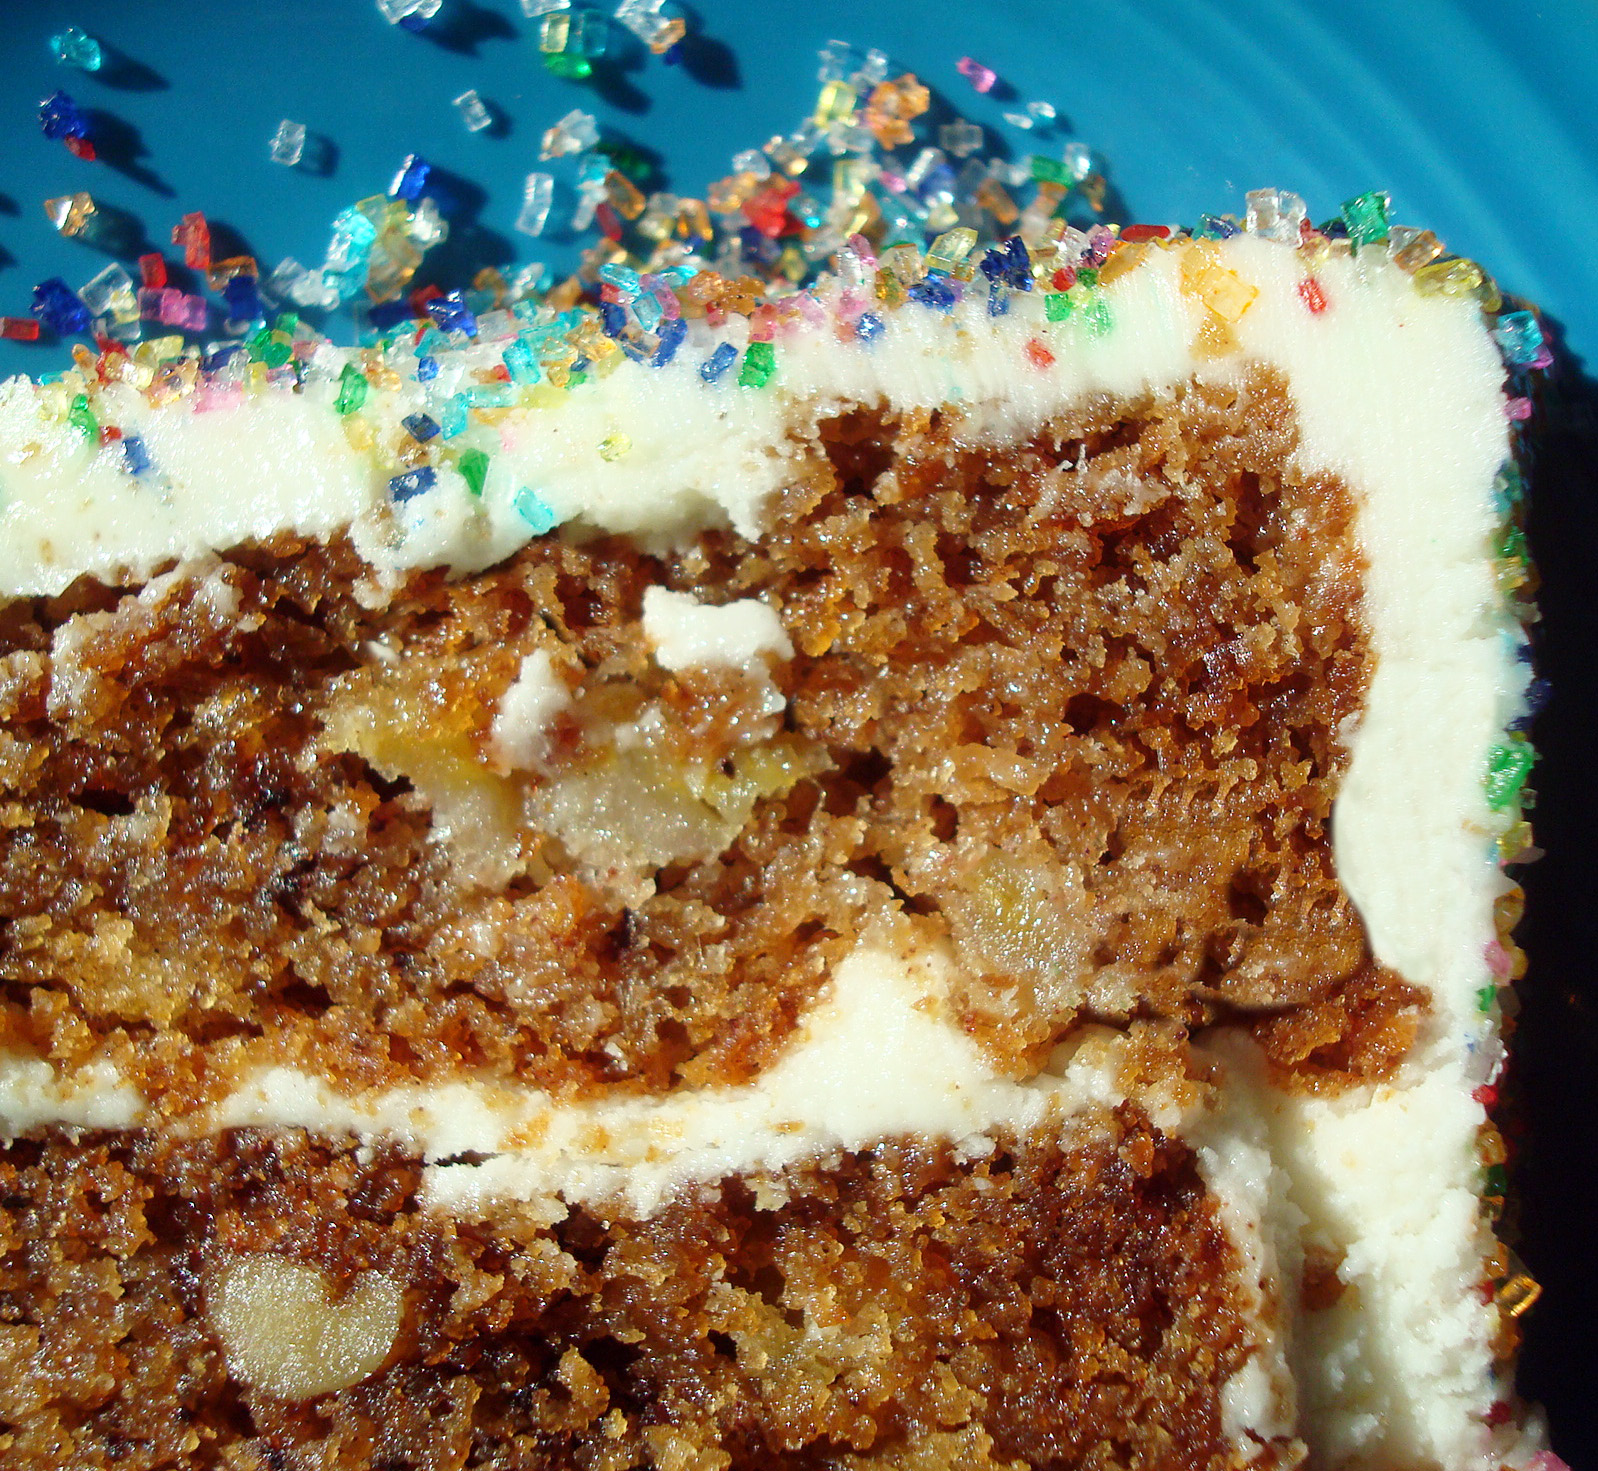 GF Cake - so festive!